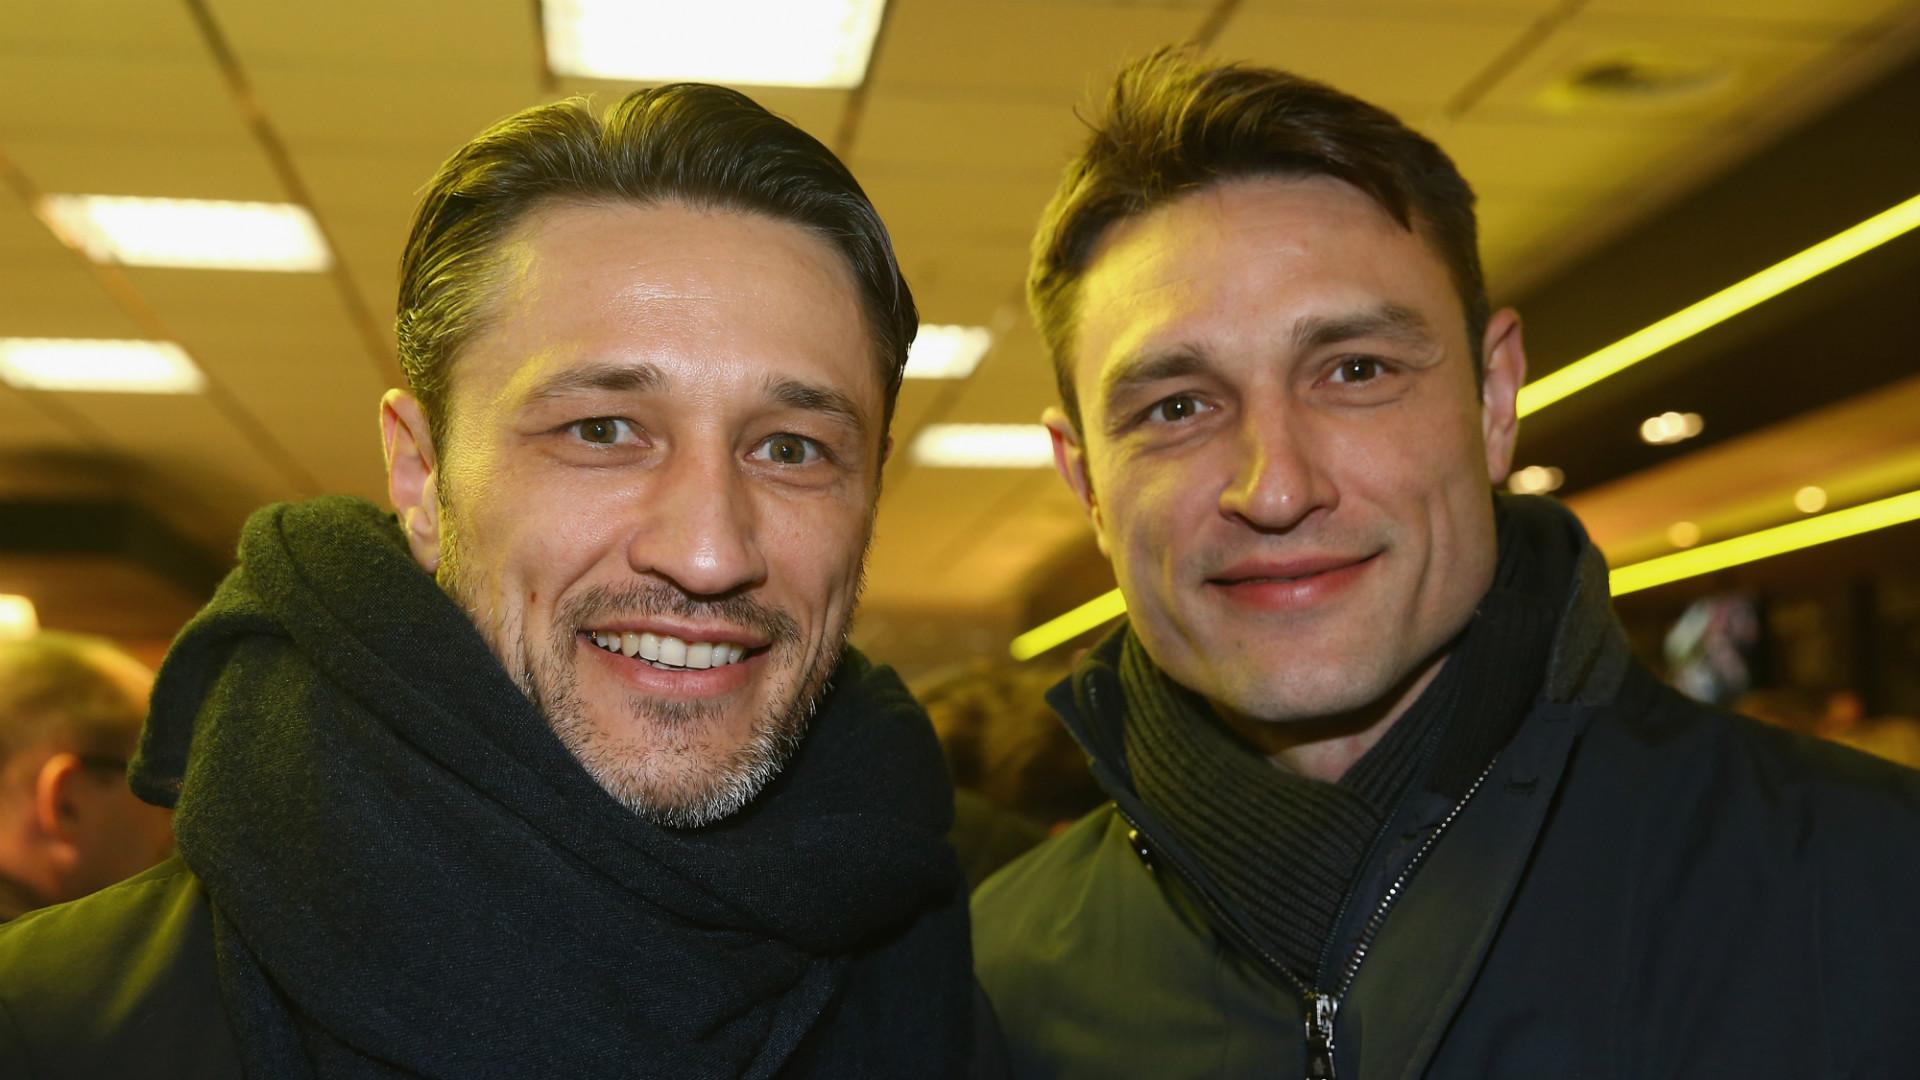 Niko and Robert Kovac, Eintracht Frankfurt